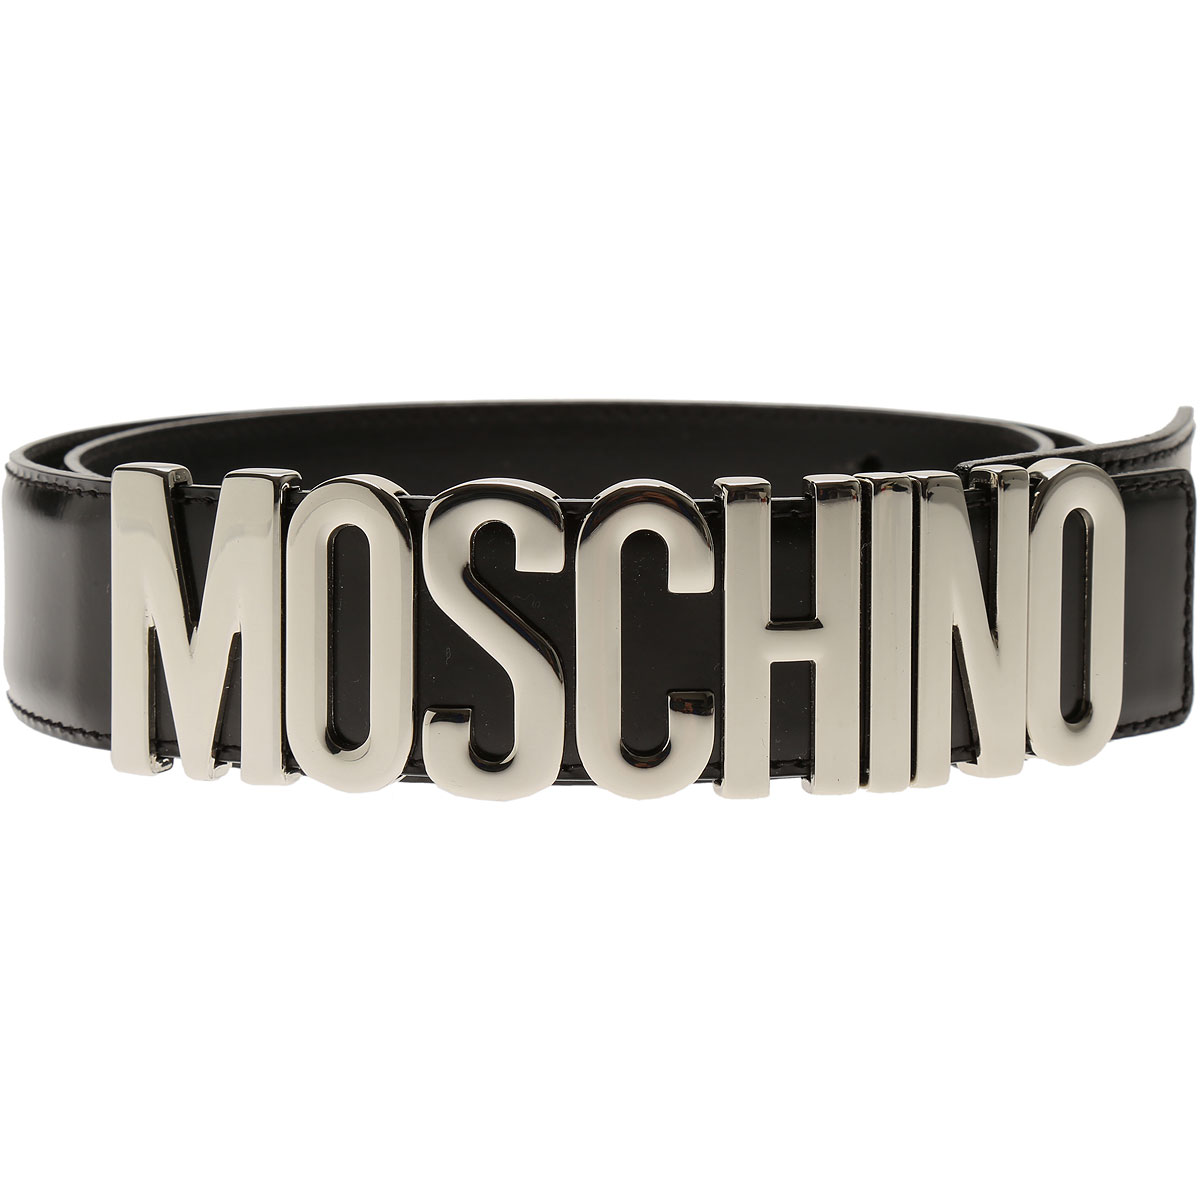 Moschino Womens Belts, Black, Leather, 2017, Eu - 38 Eu - 40 EU - 42 Eu - 44 Eu - 46